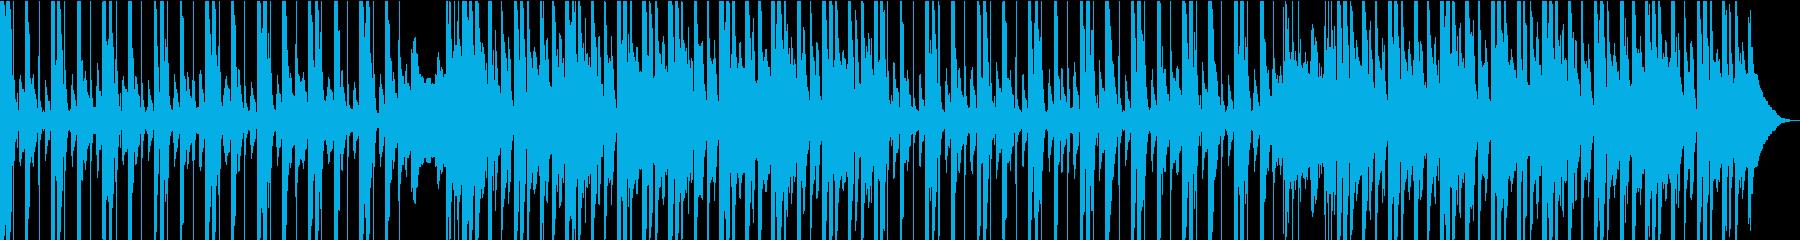 Children's Musicの再生済みの波形